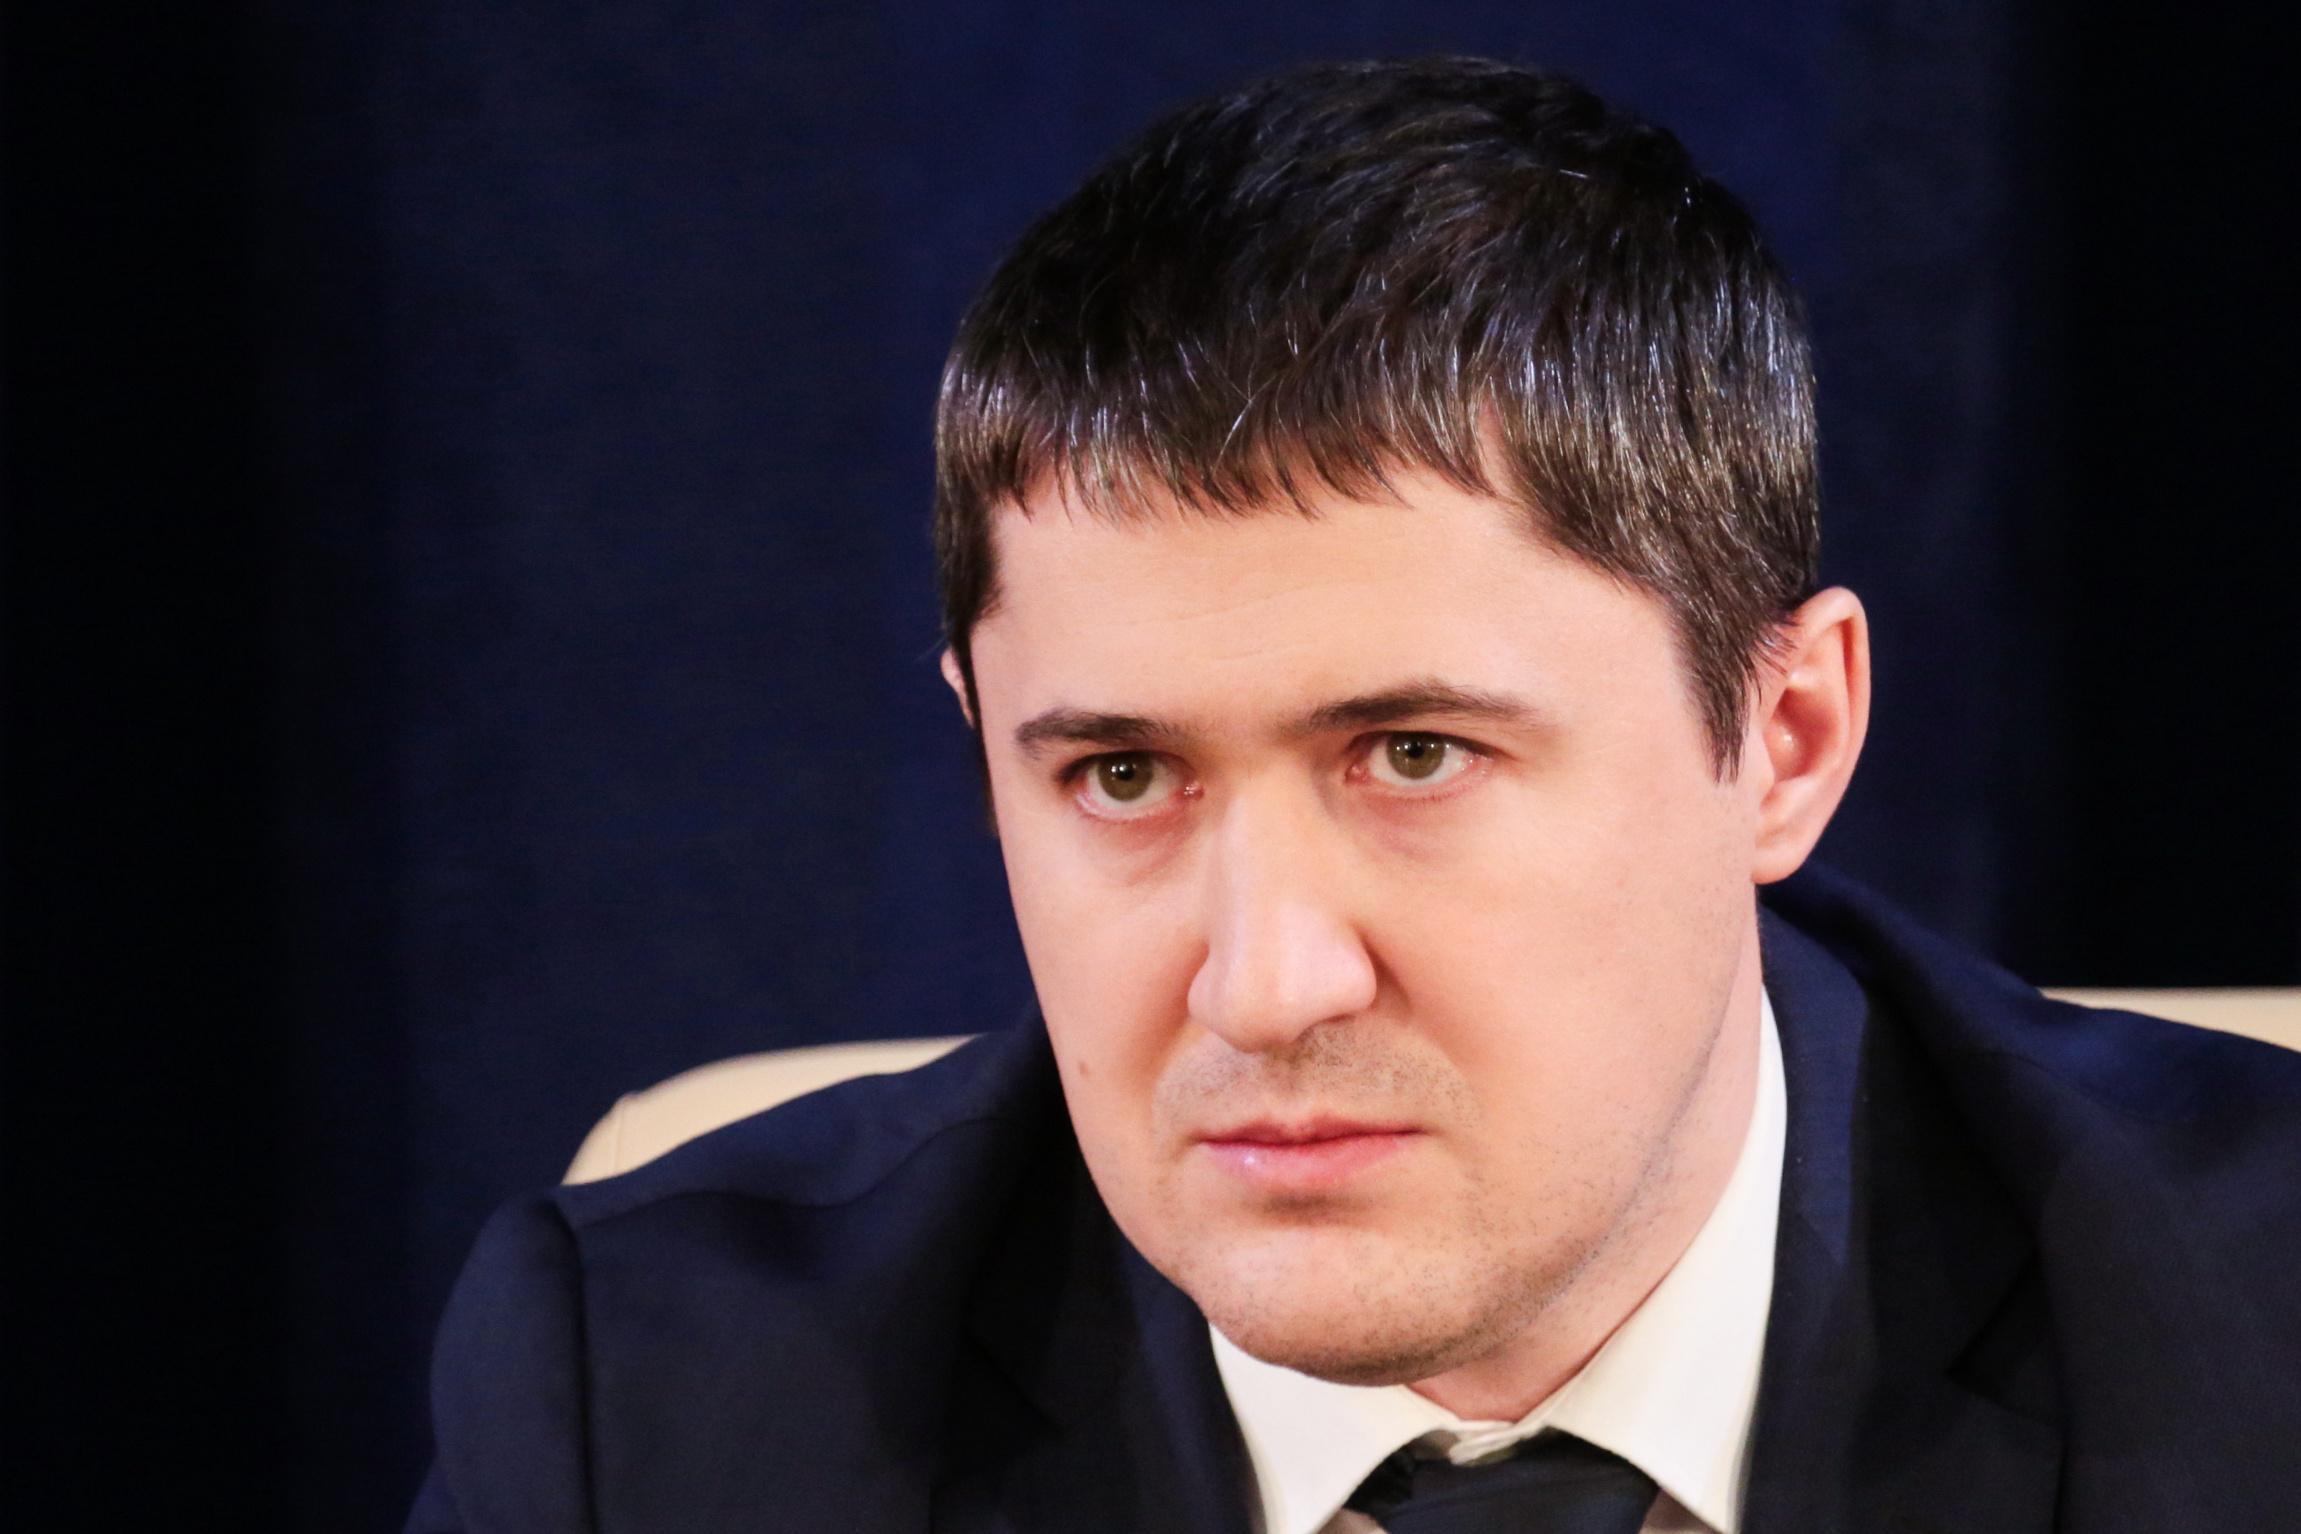 <p>Губернатор Пермского края Дмитрий Махонин. Фото © ТАСС / Максим Кимерлинг</p>